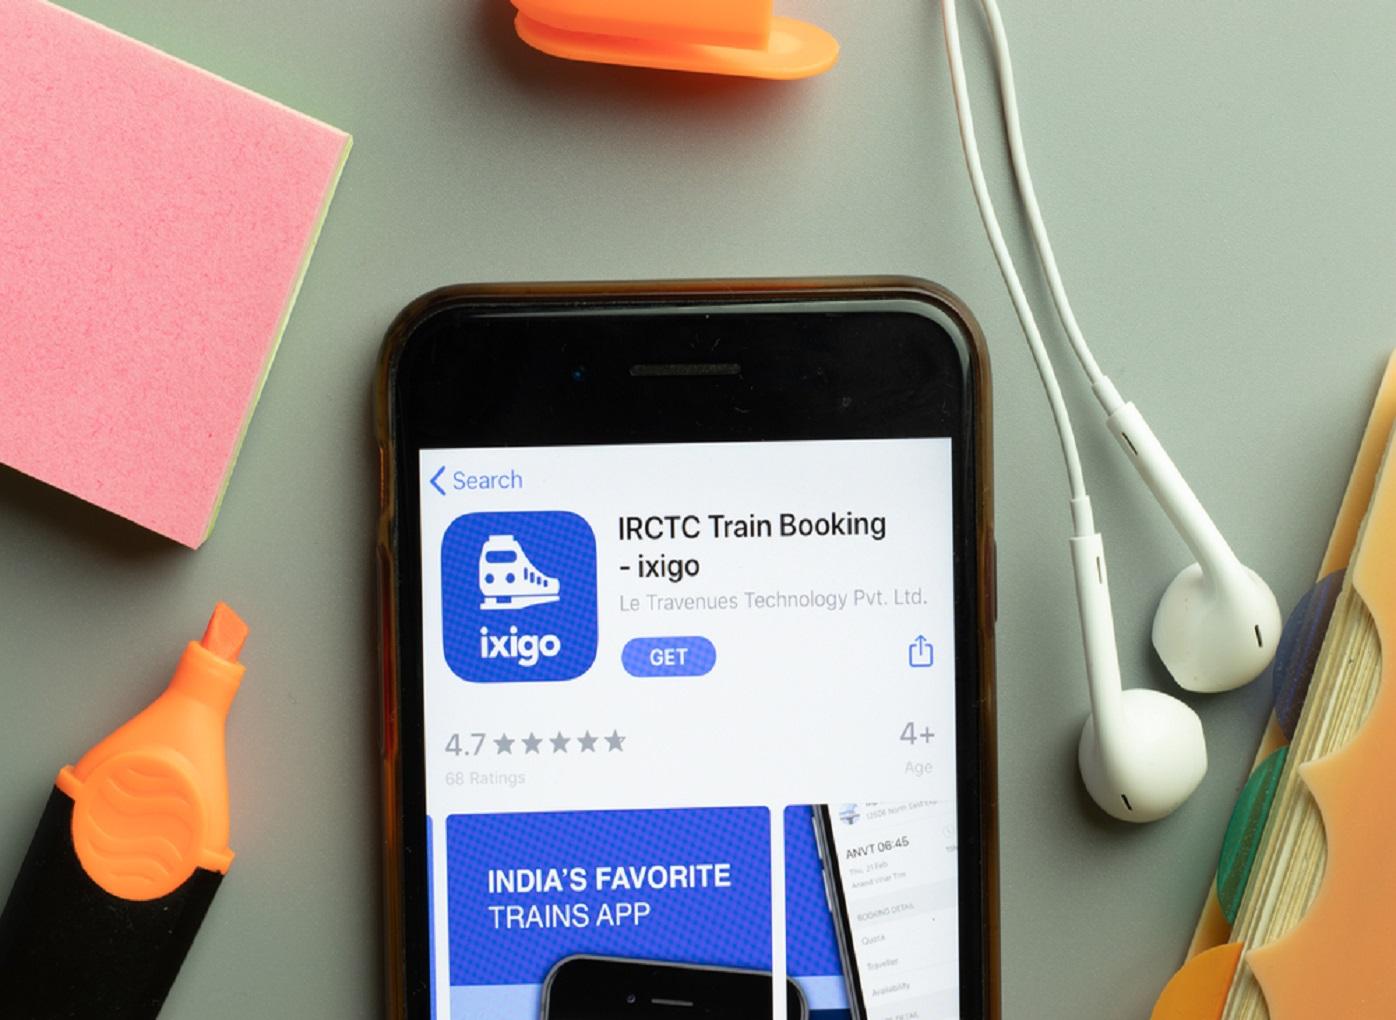 Here's How ixigo Parent Le Travenues Plans To Utilise IPO Proceeds